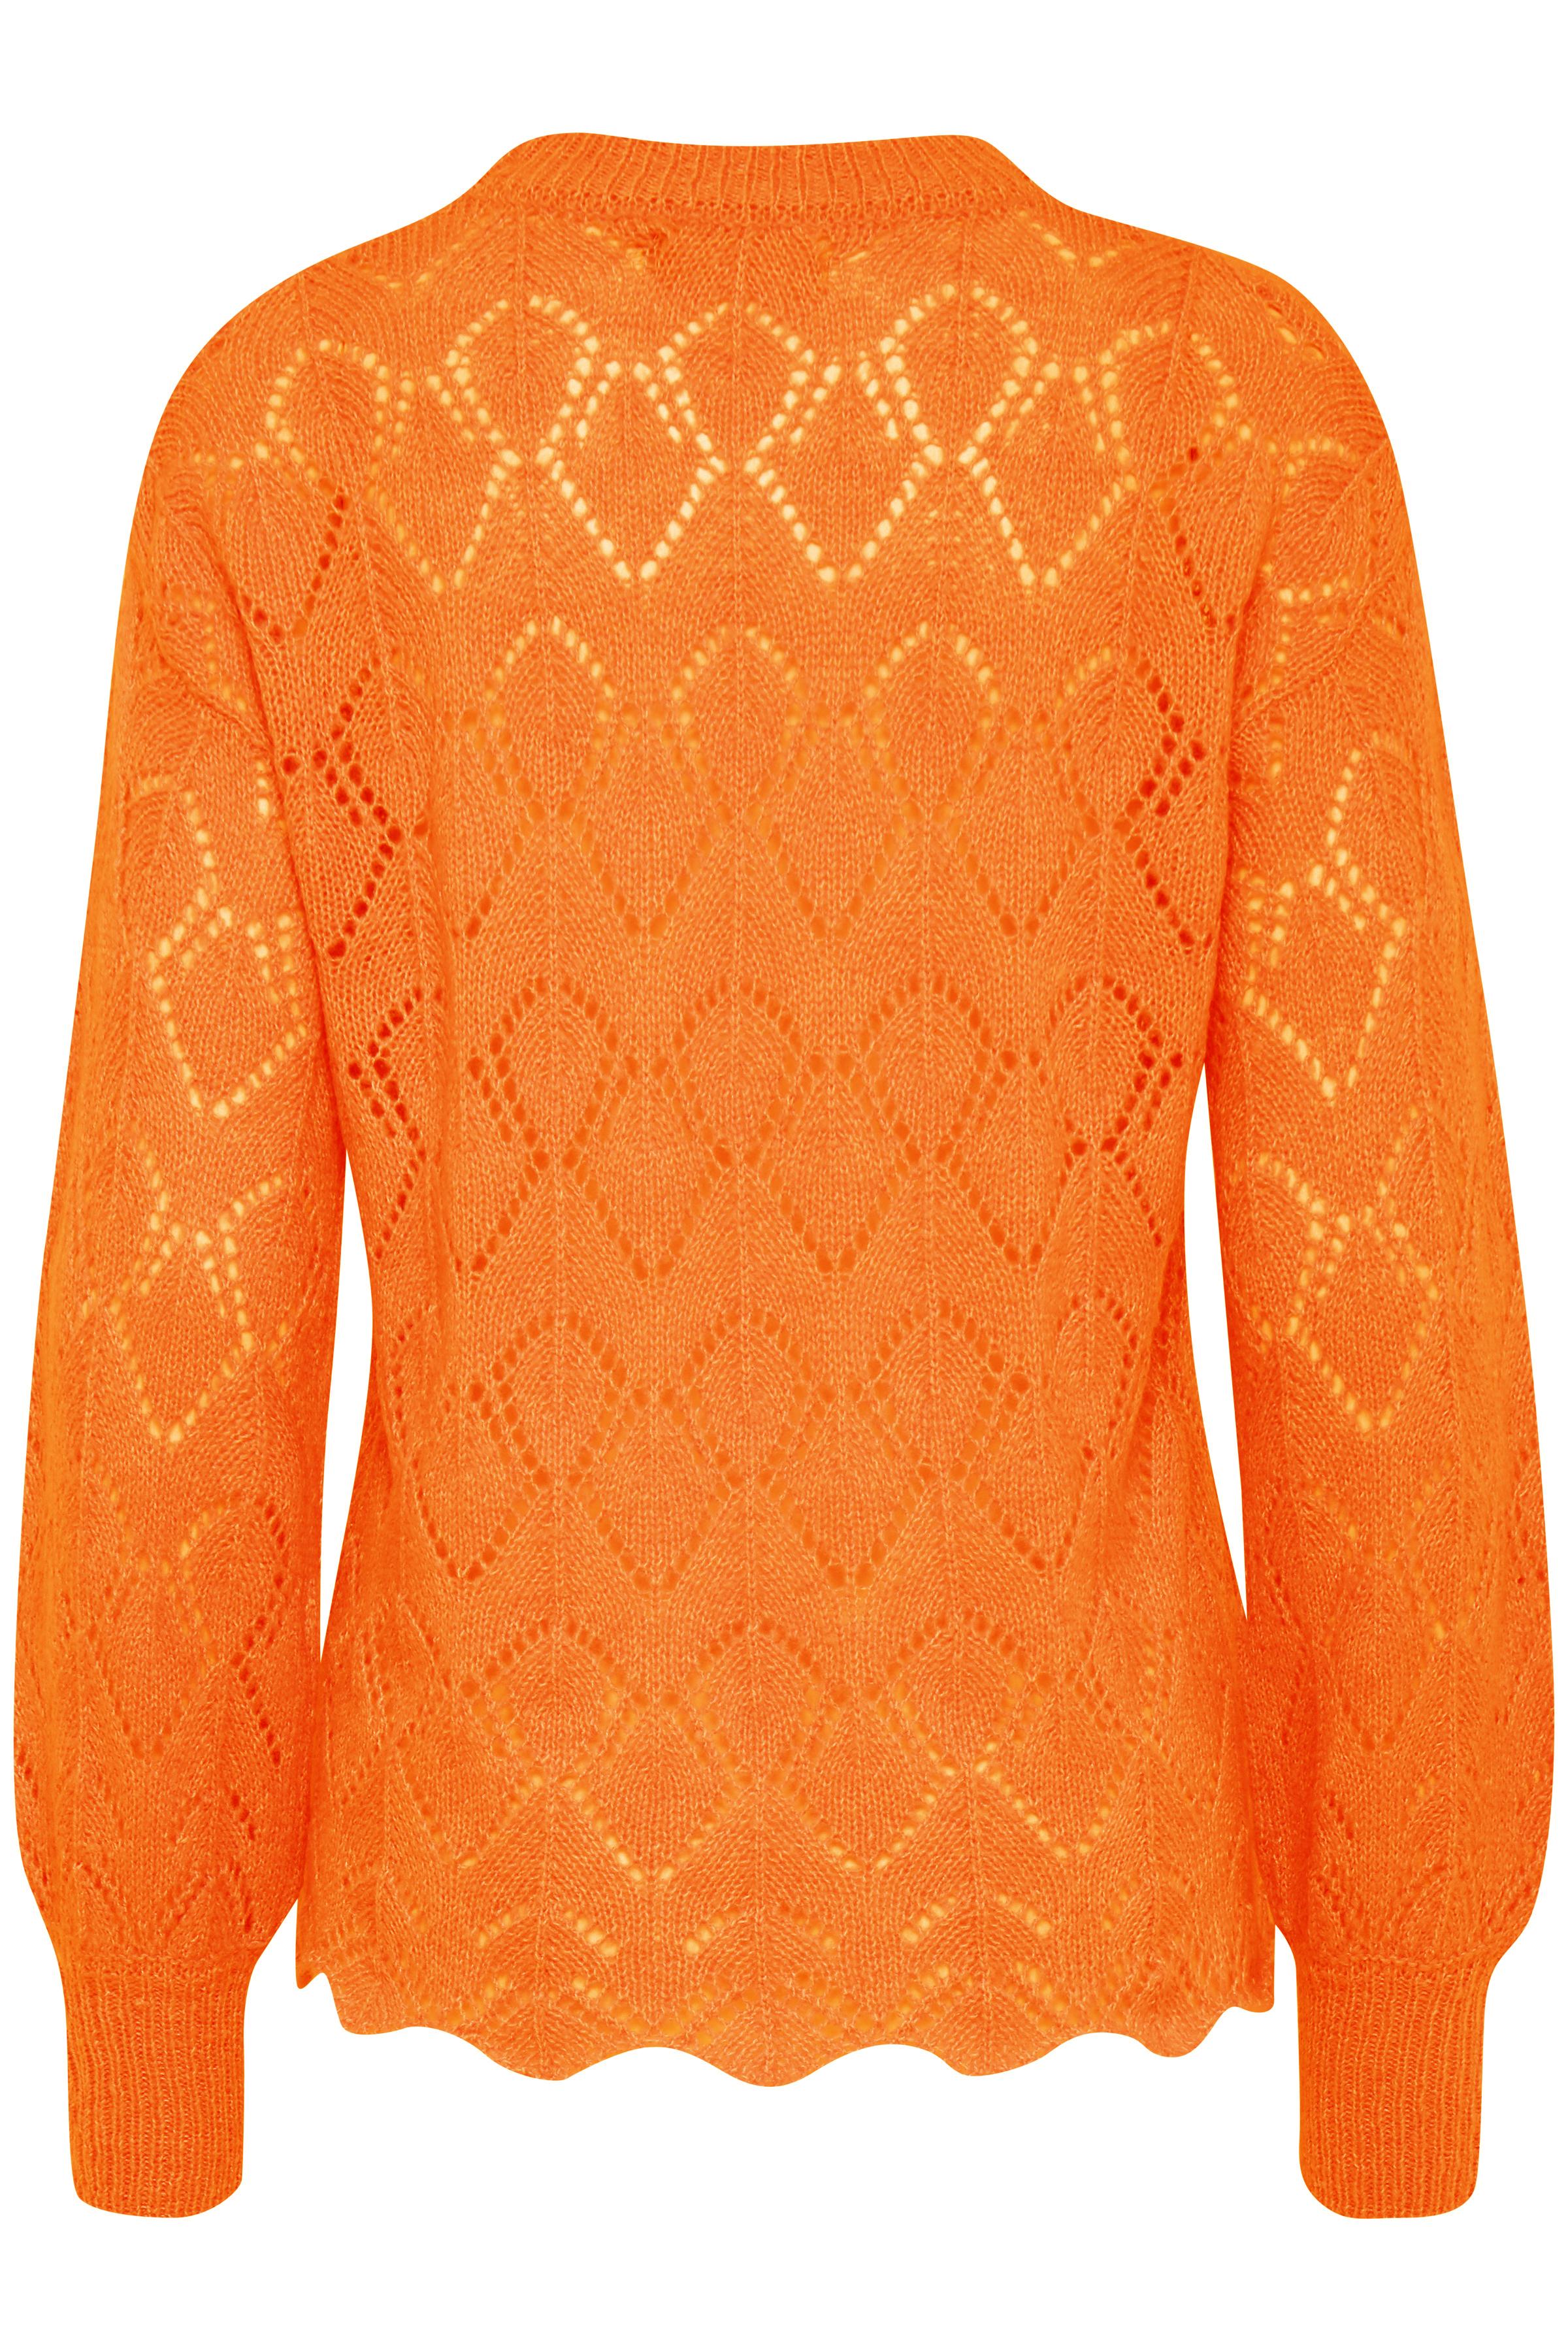 Sun Orange Mel. Stickad pullover från b.young – Köp Sun Orange Mel. Stickad pullover från storlek XS-XXL här